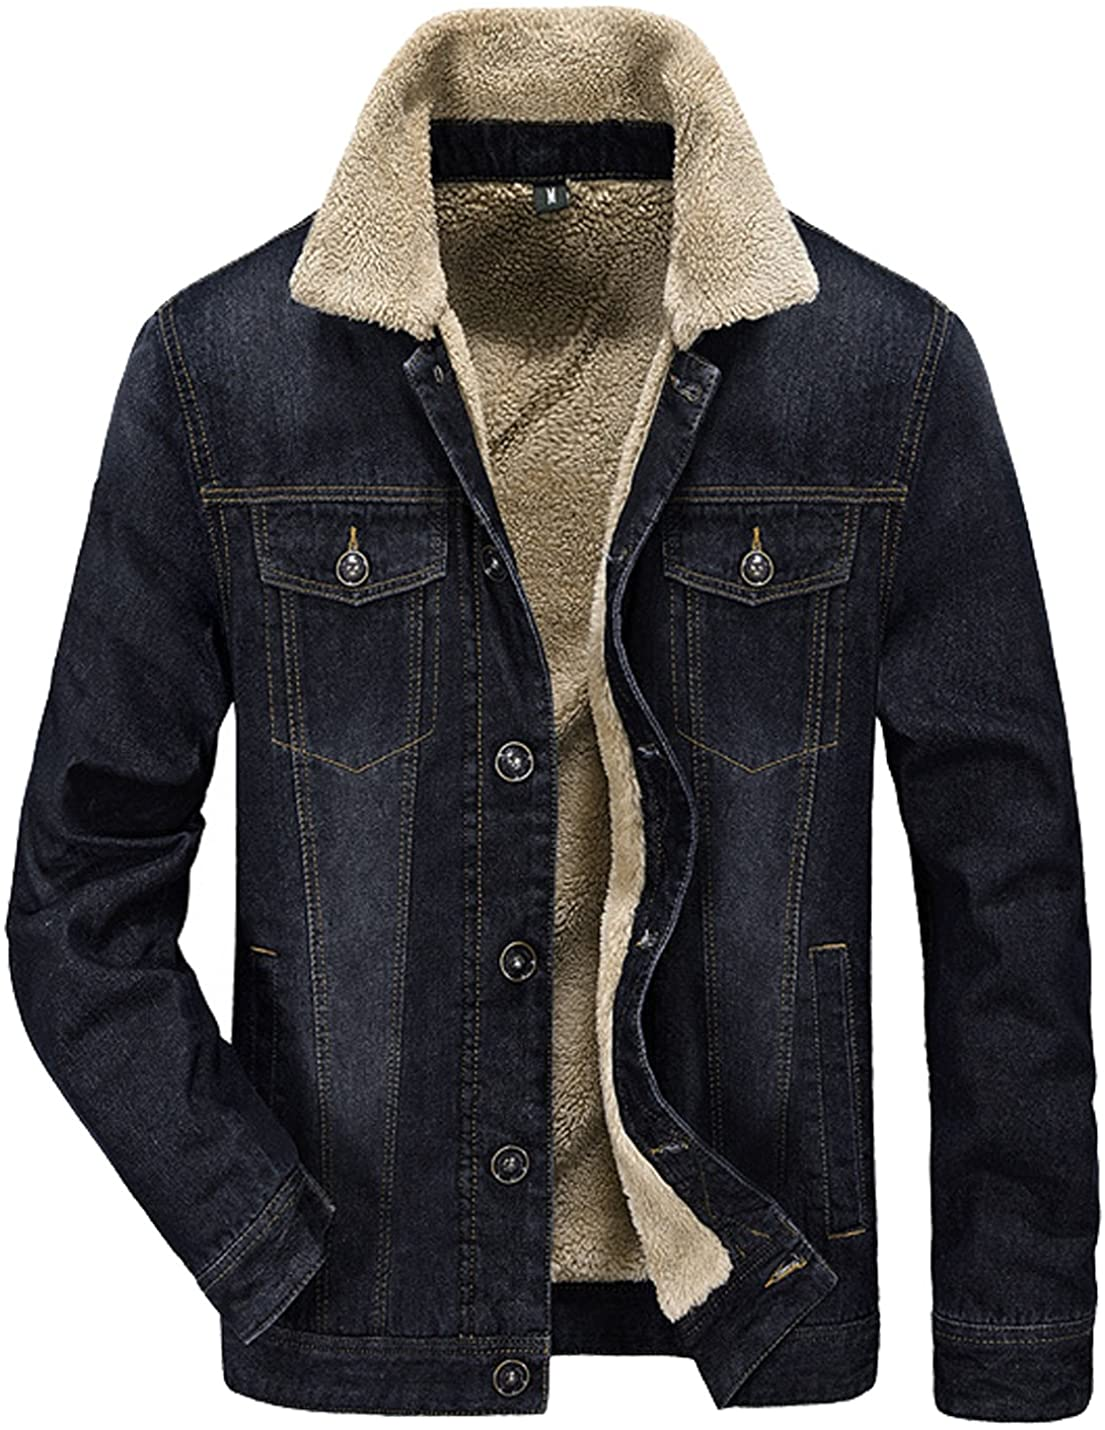 Tanming Men's Winter Warm Fur Lapel Collar Sherpa Fleece Lin